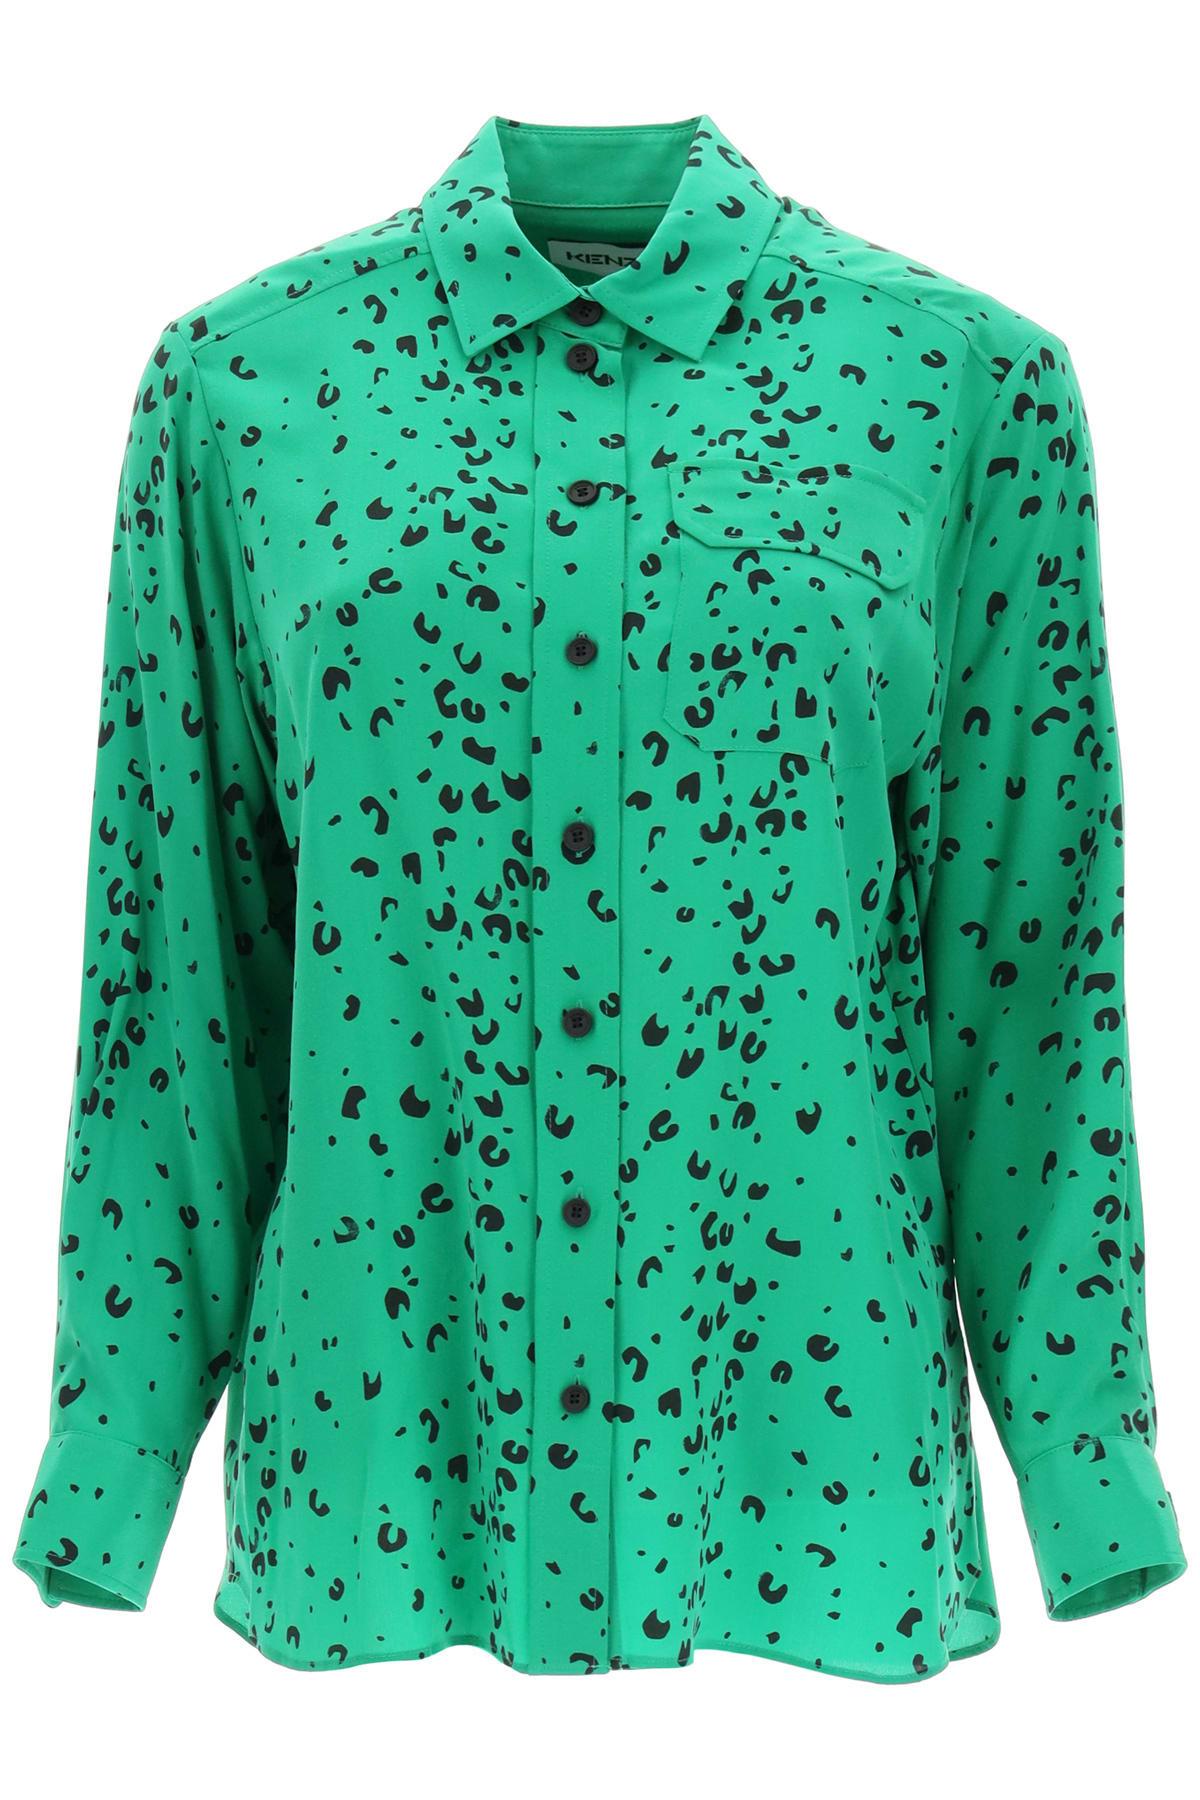 Kenzo Cheetah Print Silk Shirt